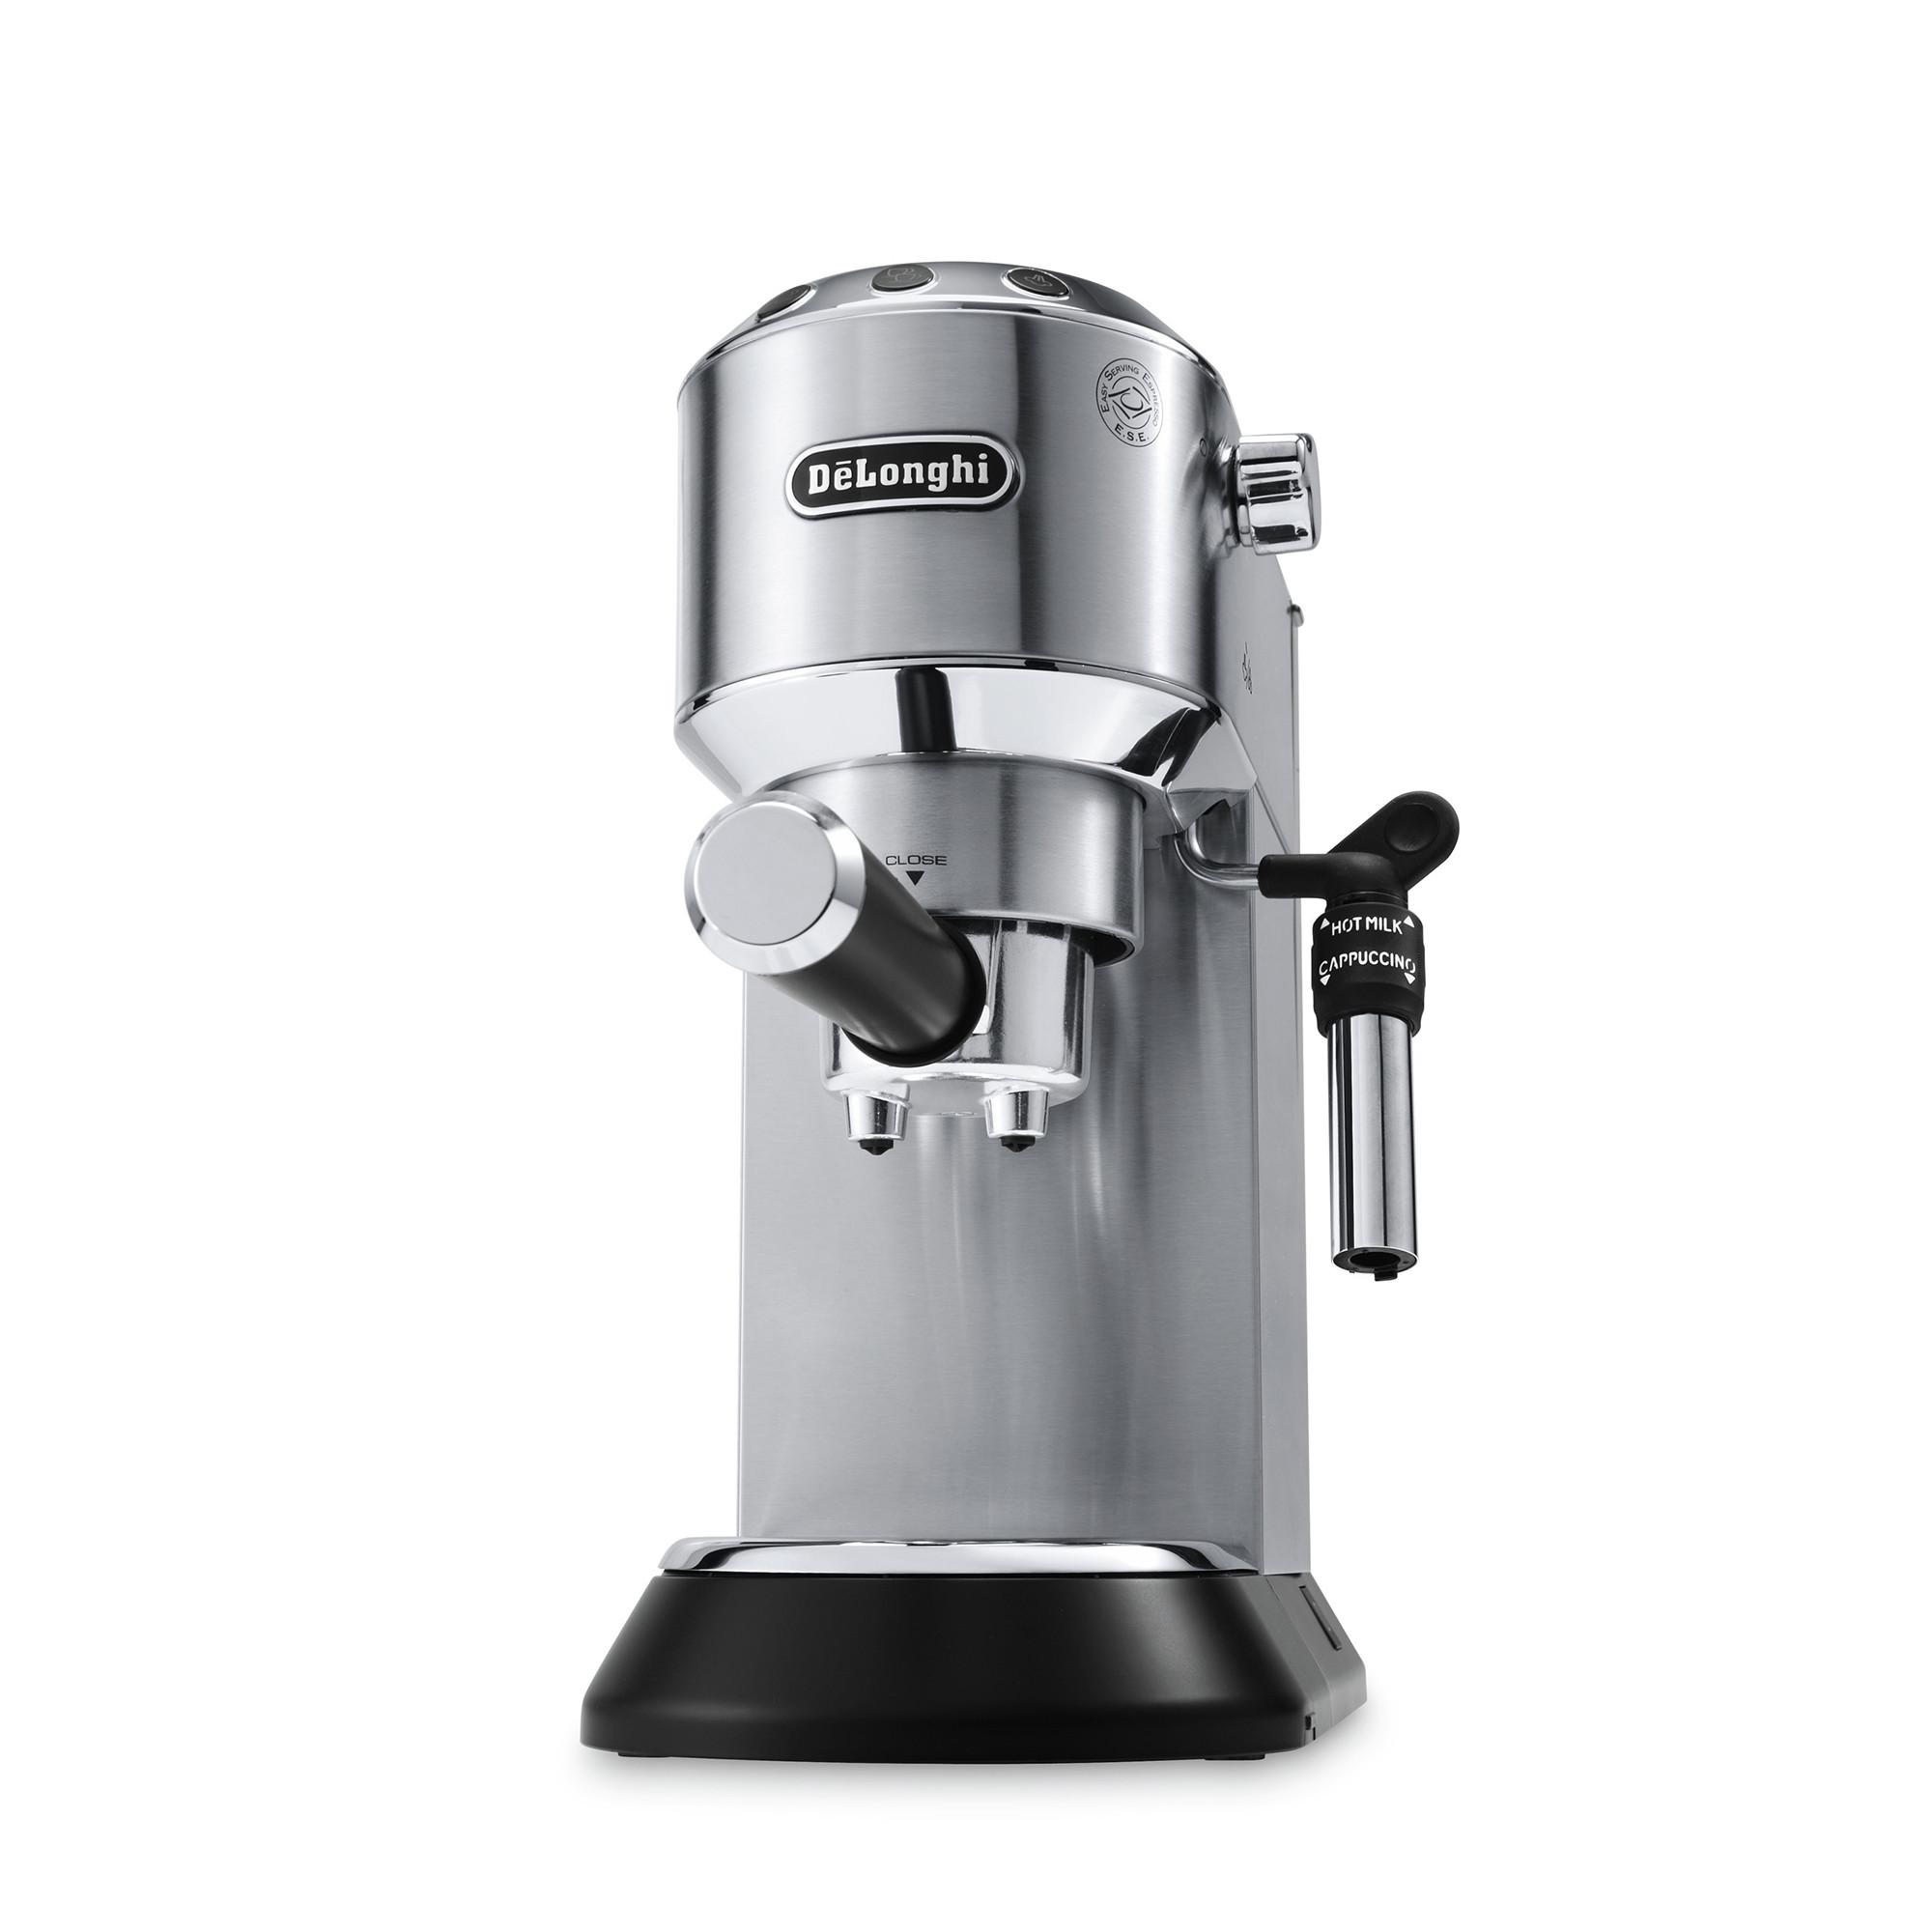 Image of   DeLonghi EC685 Espresso, stål.